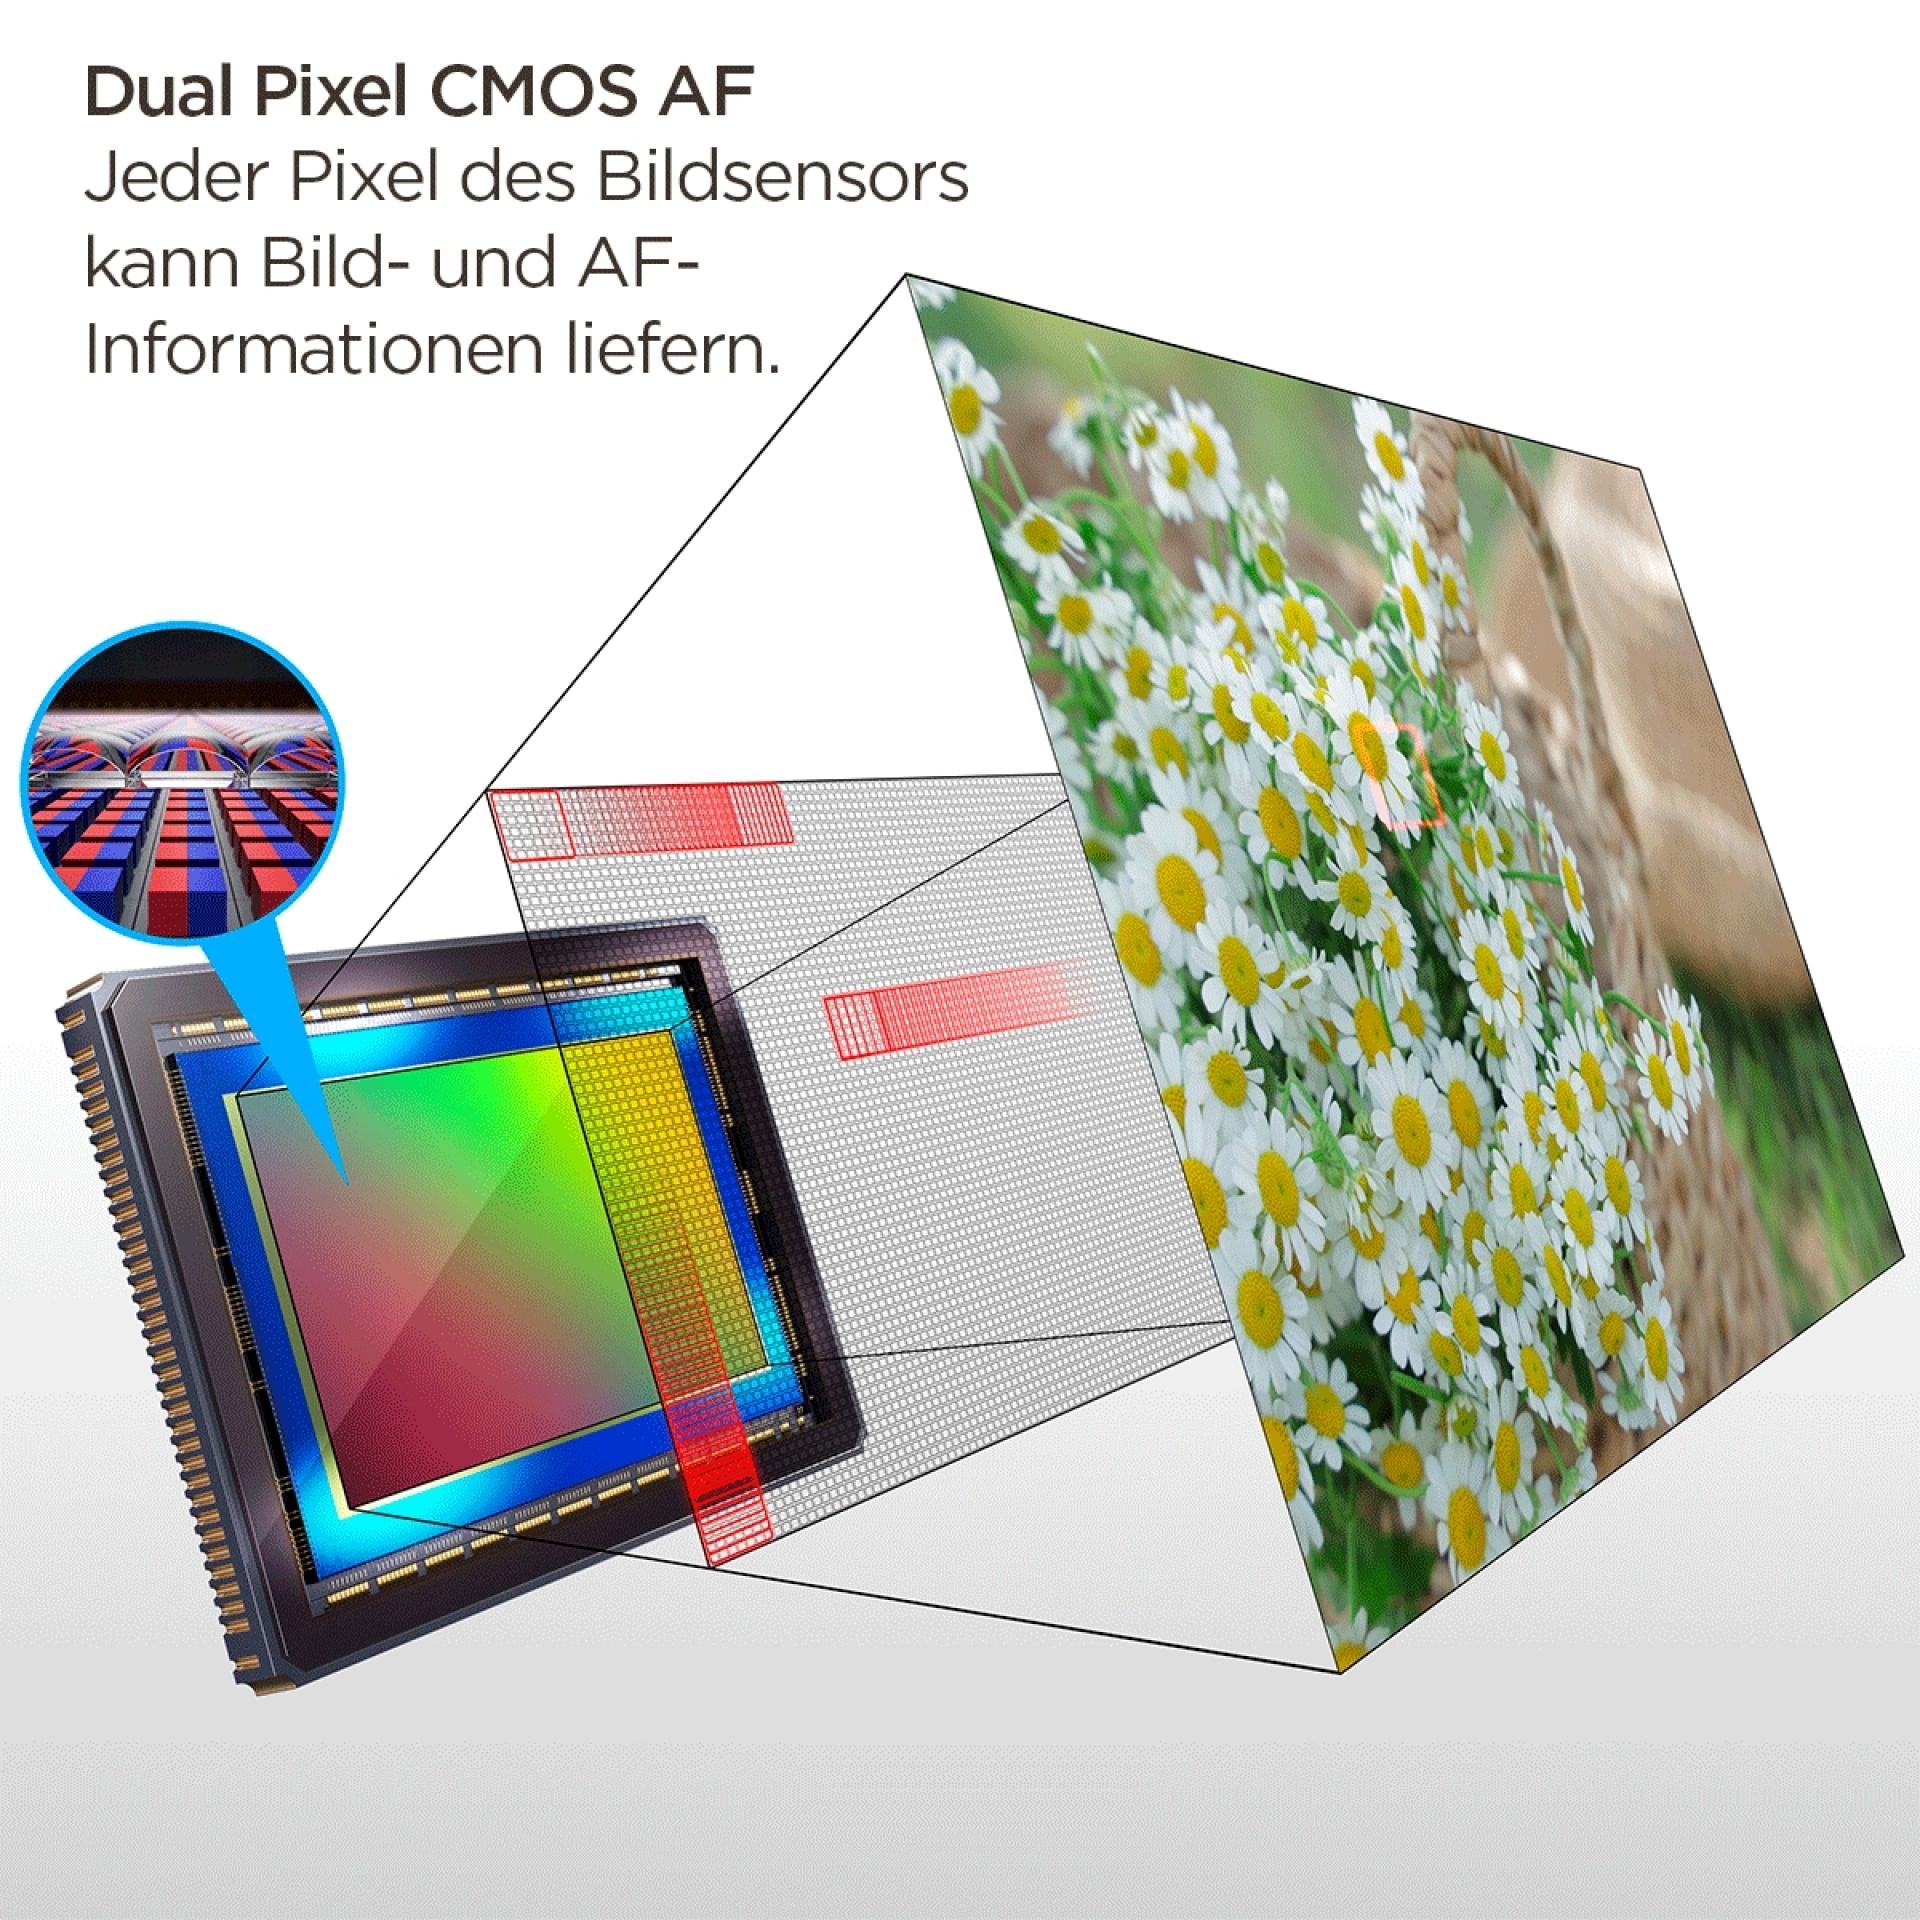 Dual Pixel CMOS AF Technologie, EOS R-System